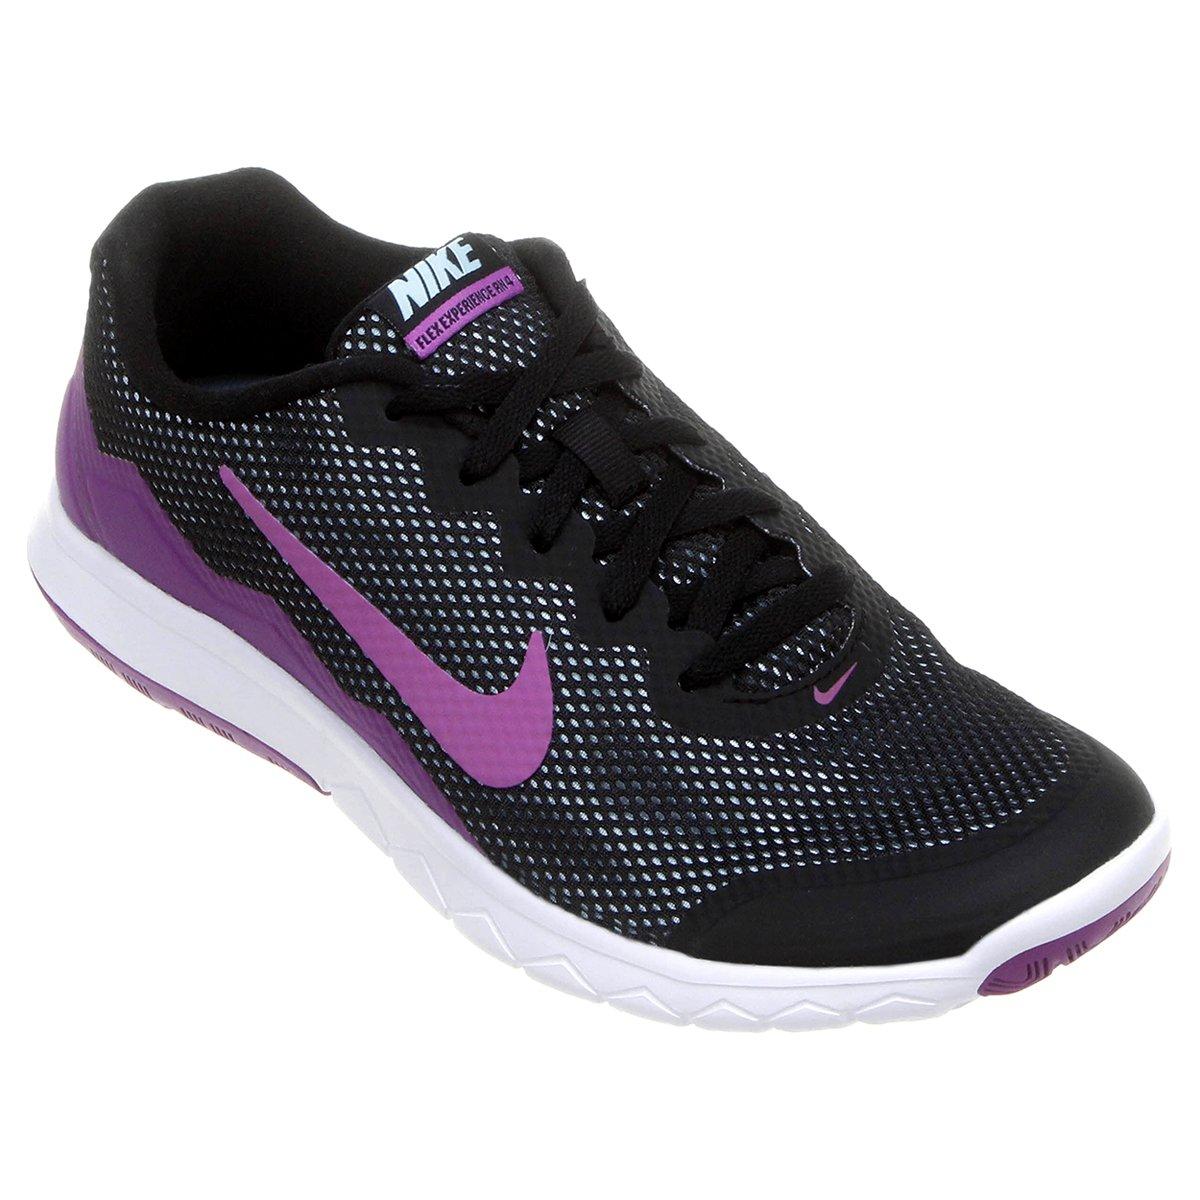 f869959041 Tênis Nike Flex Experience RN 4 Feminino - Compre Agora